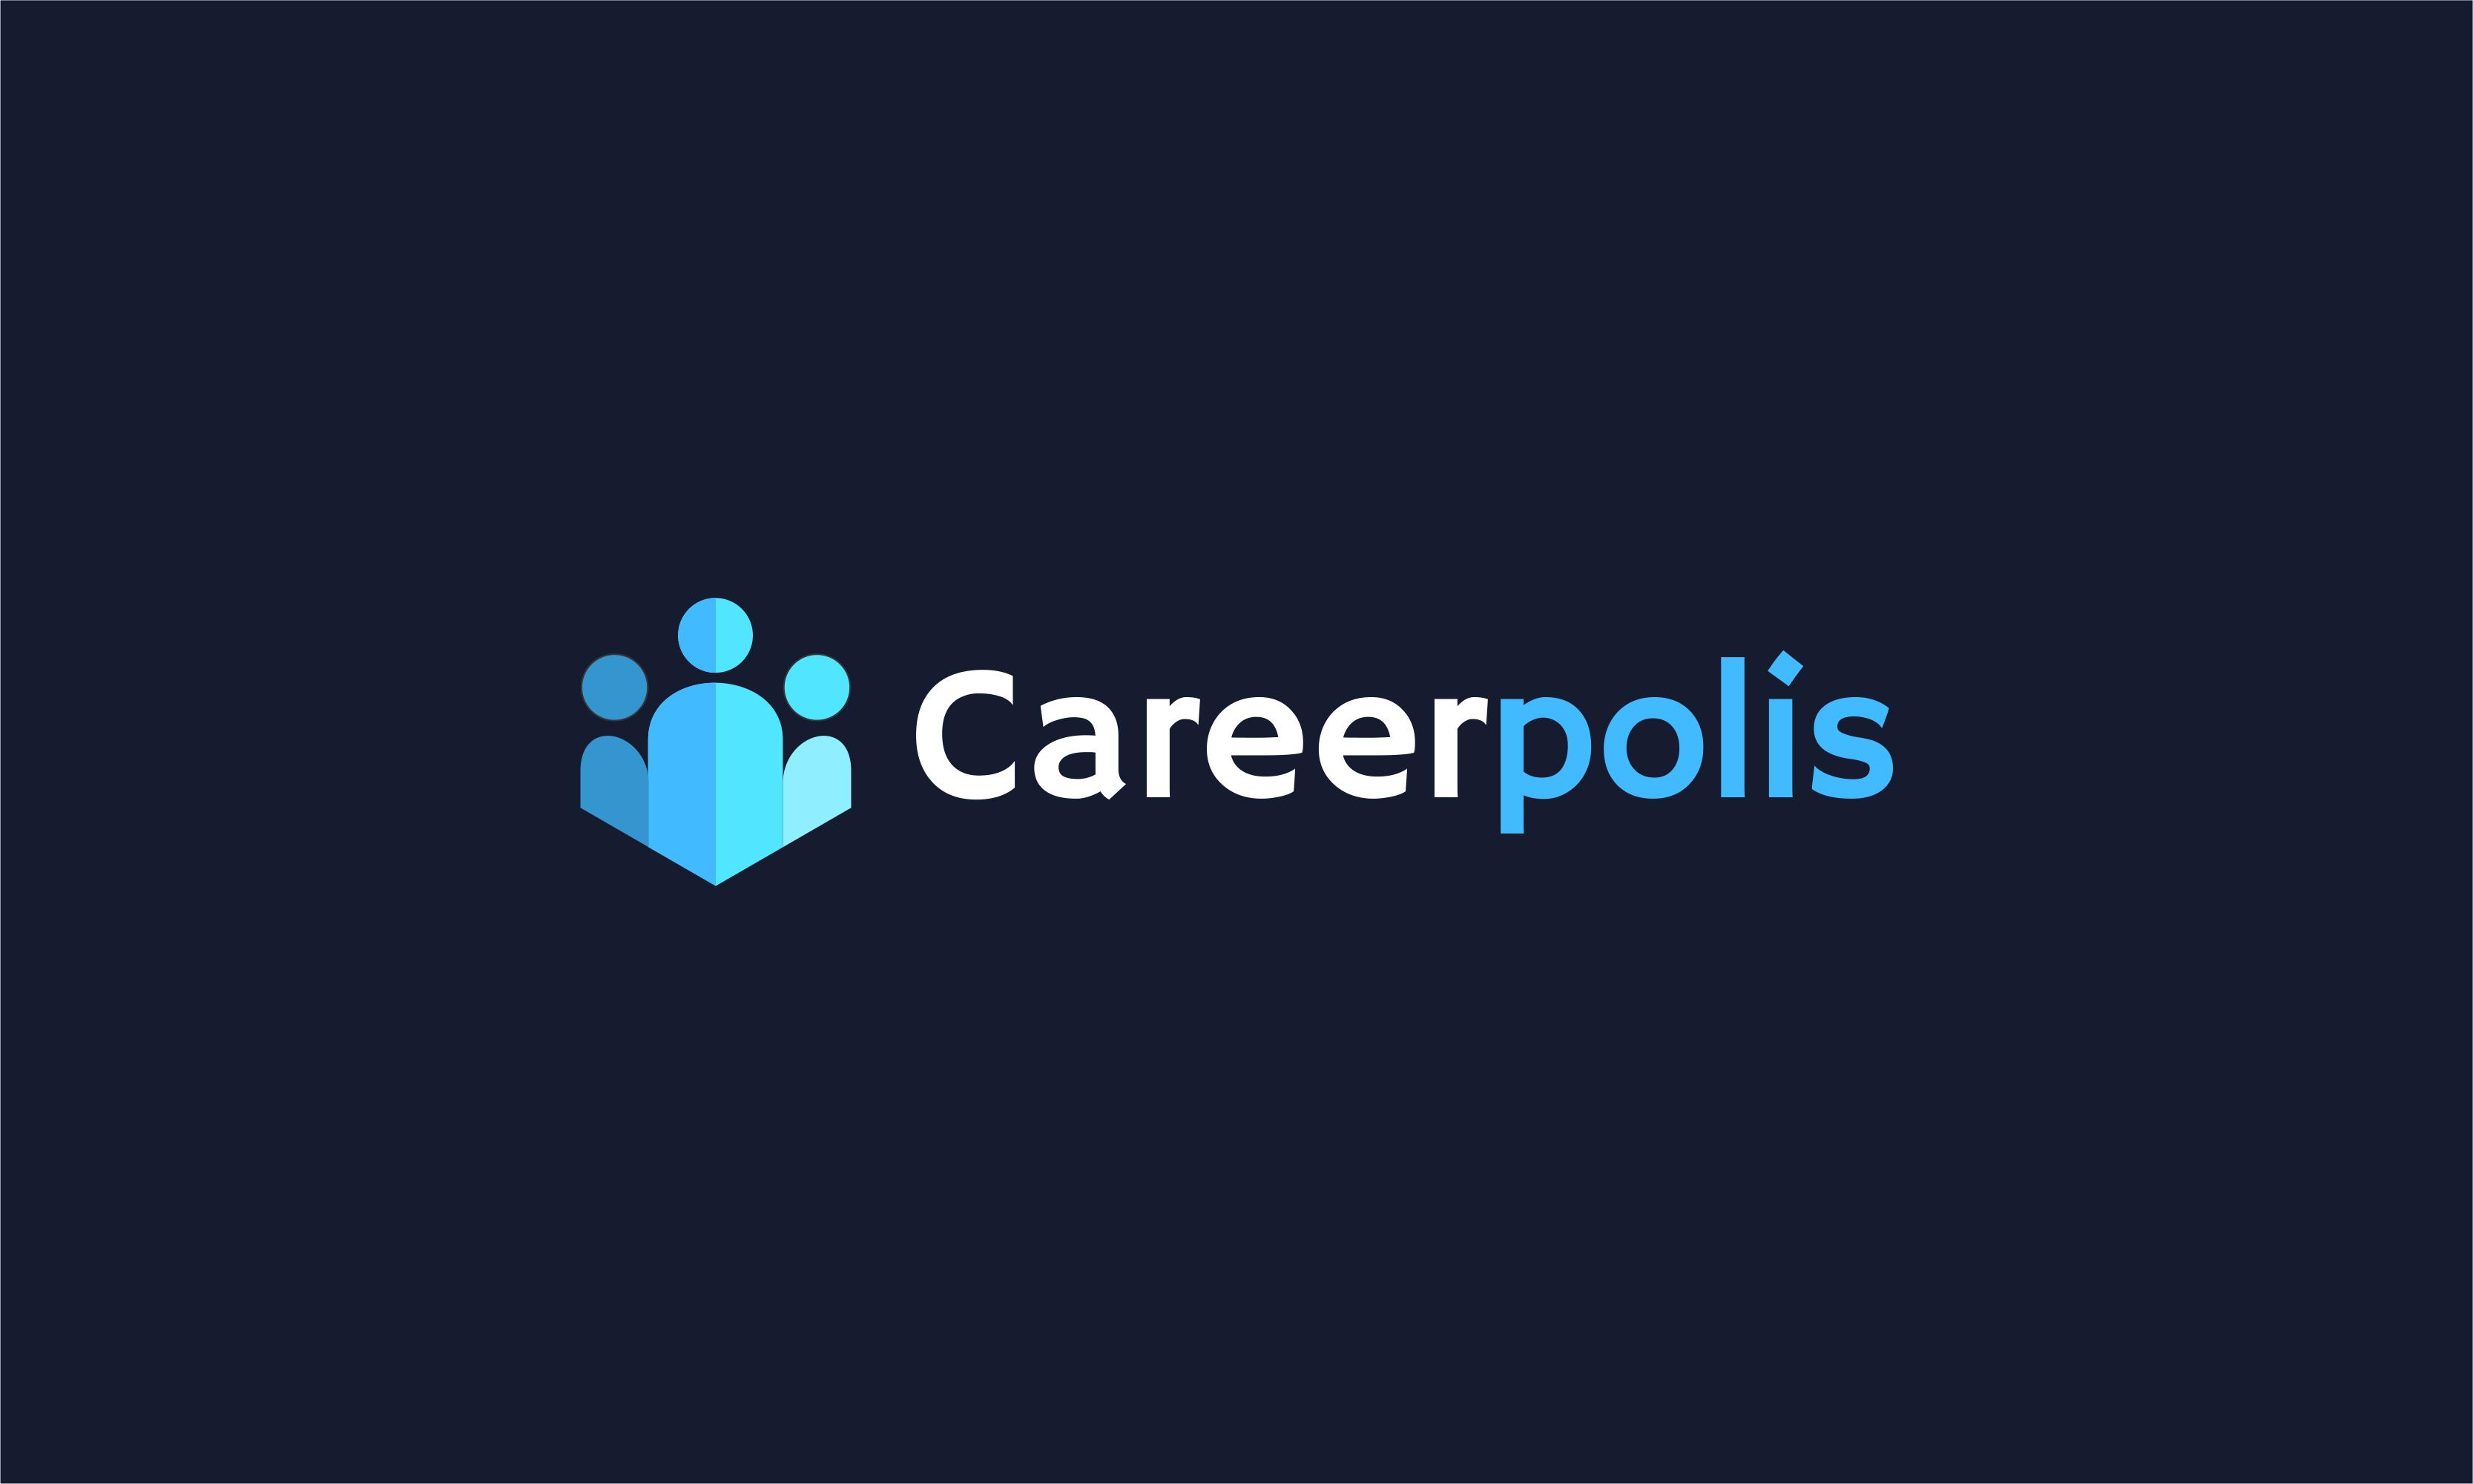 Careerpolis